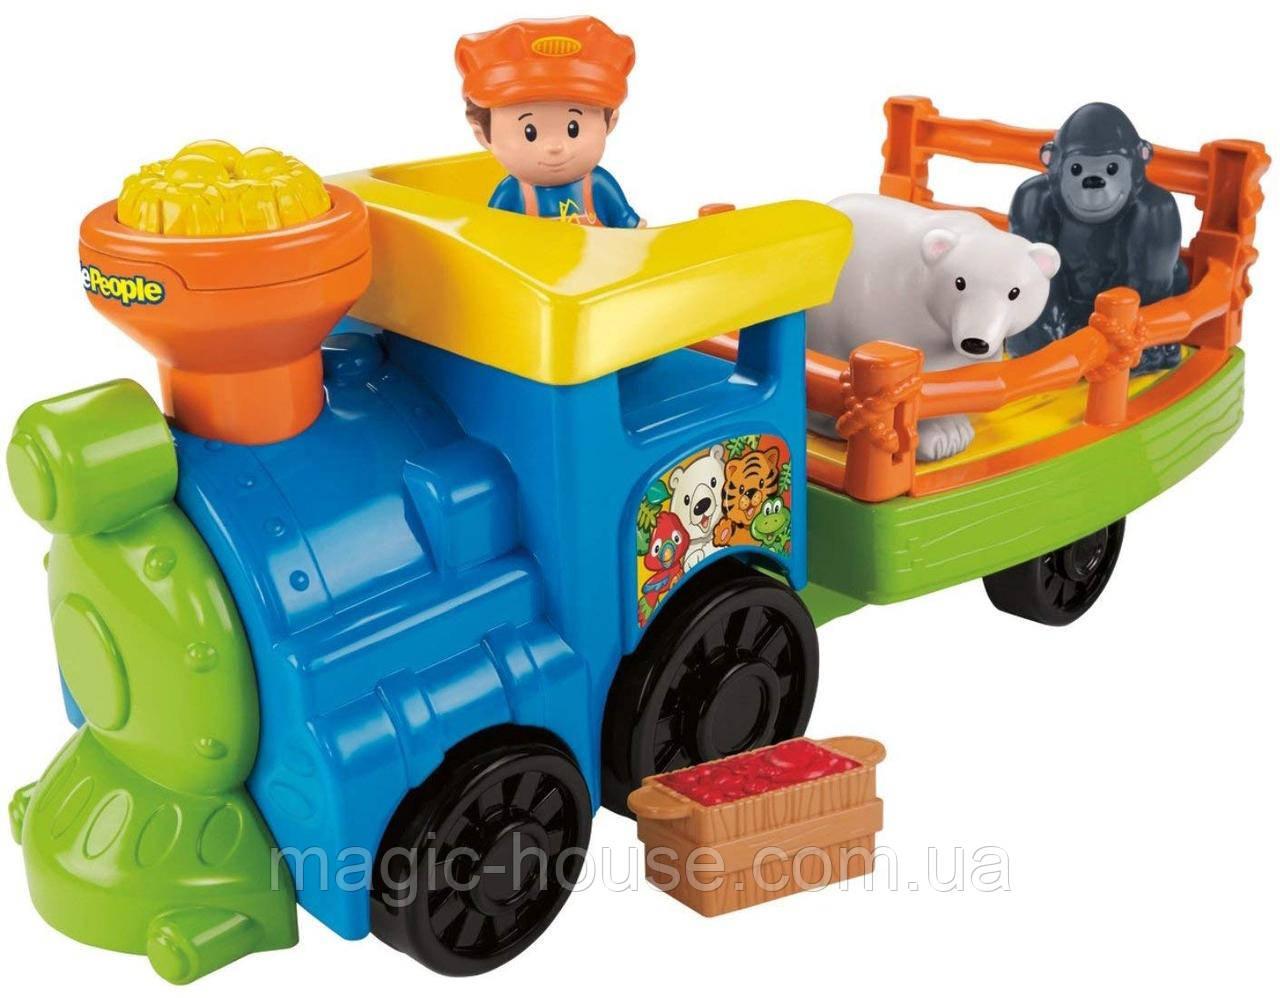 Музыкальный паровозик зоопарк Fisher Price Little People Choo-Choo Zoo Train